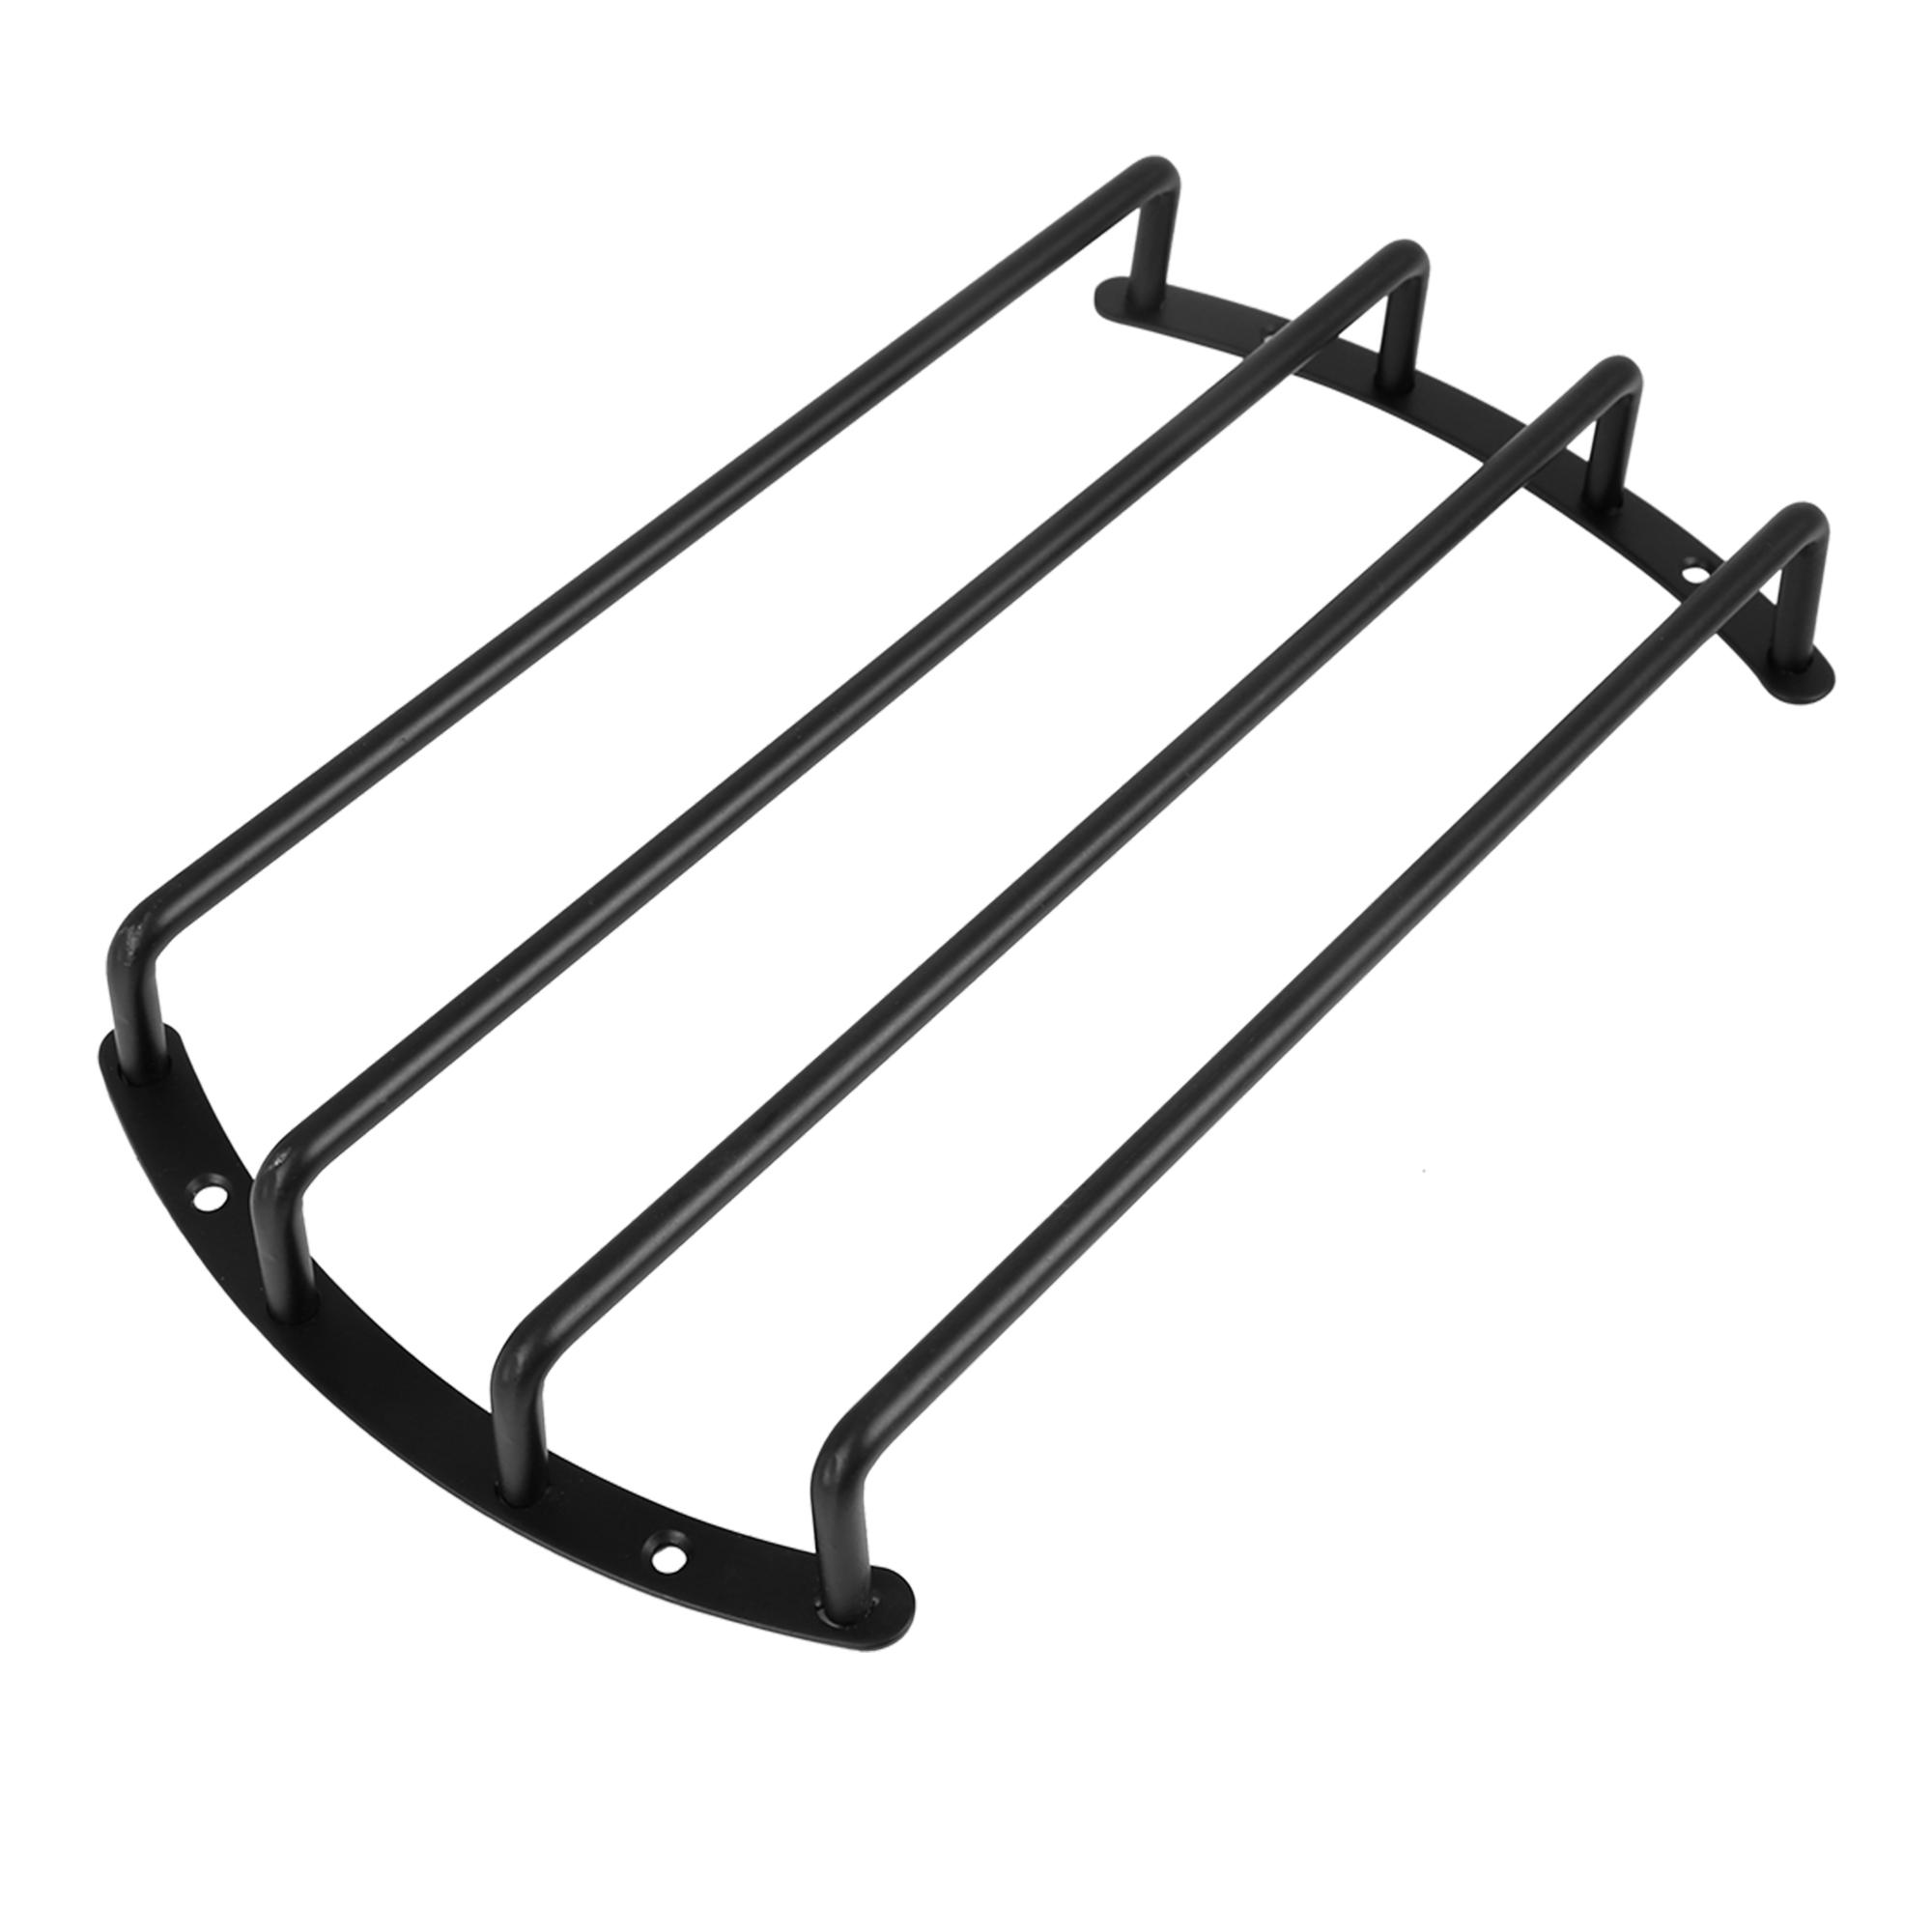 Universal 10 Inch Black Metal Car Bar Grille Subwoofer Speaker Grill Cover Guard